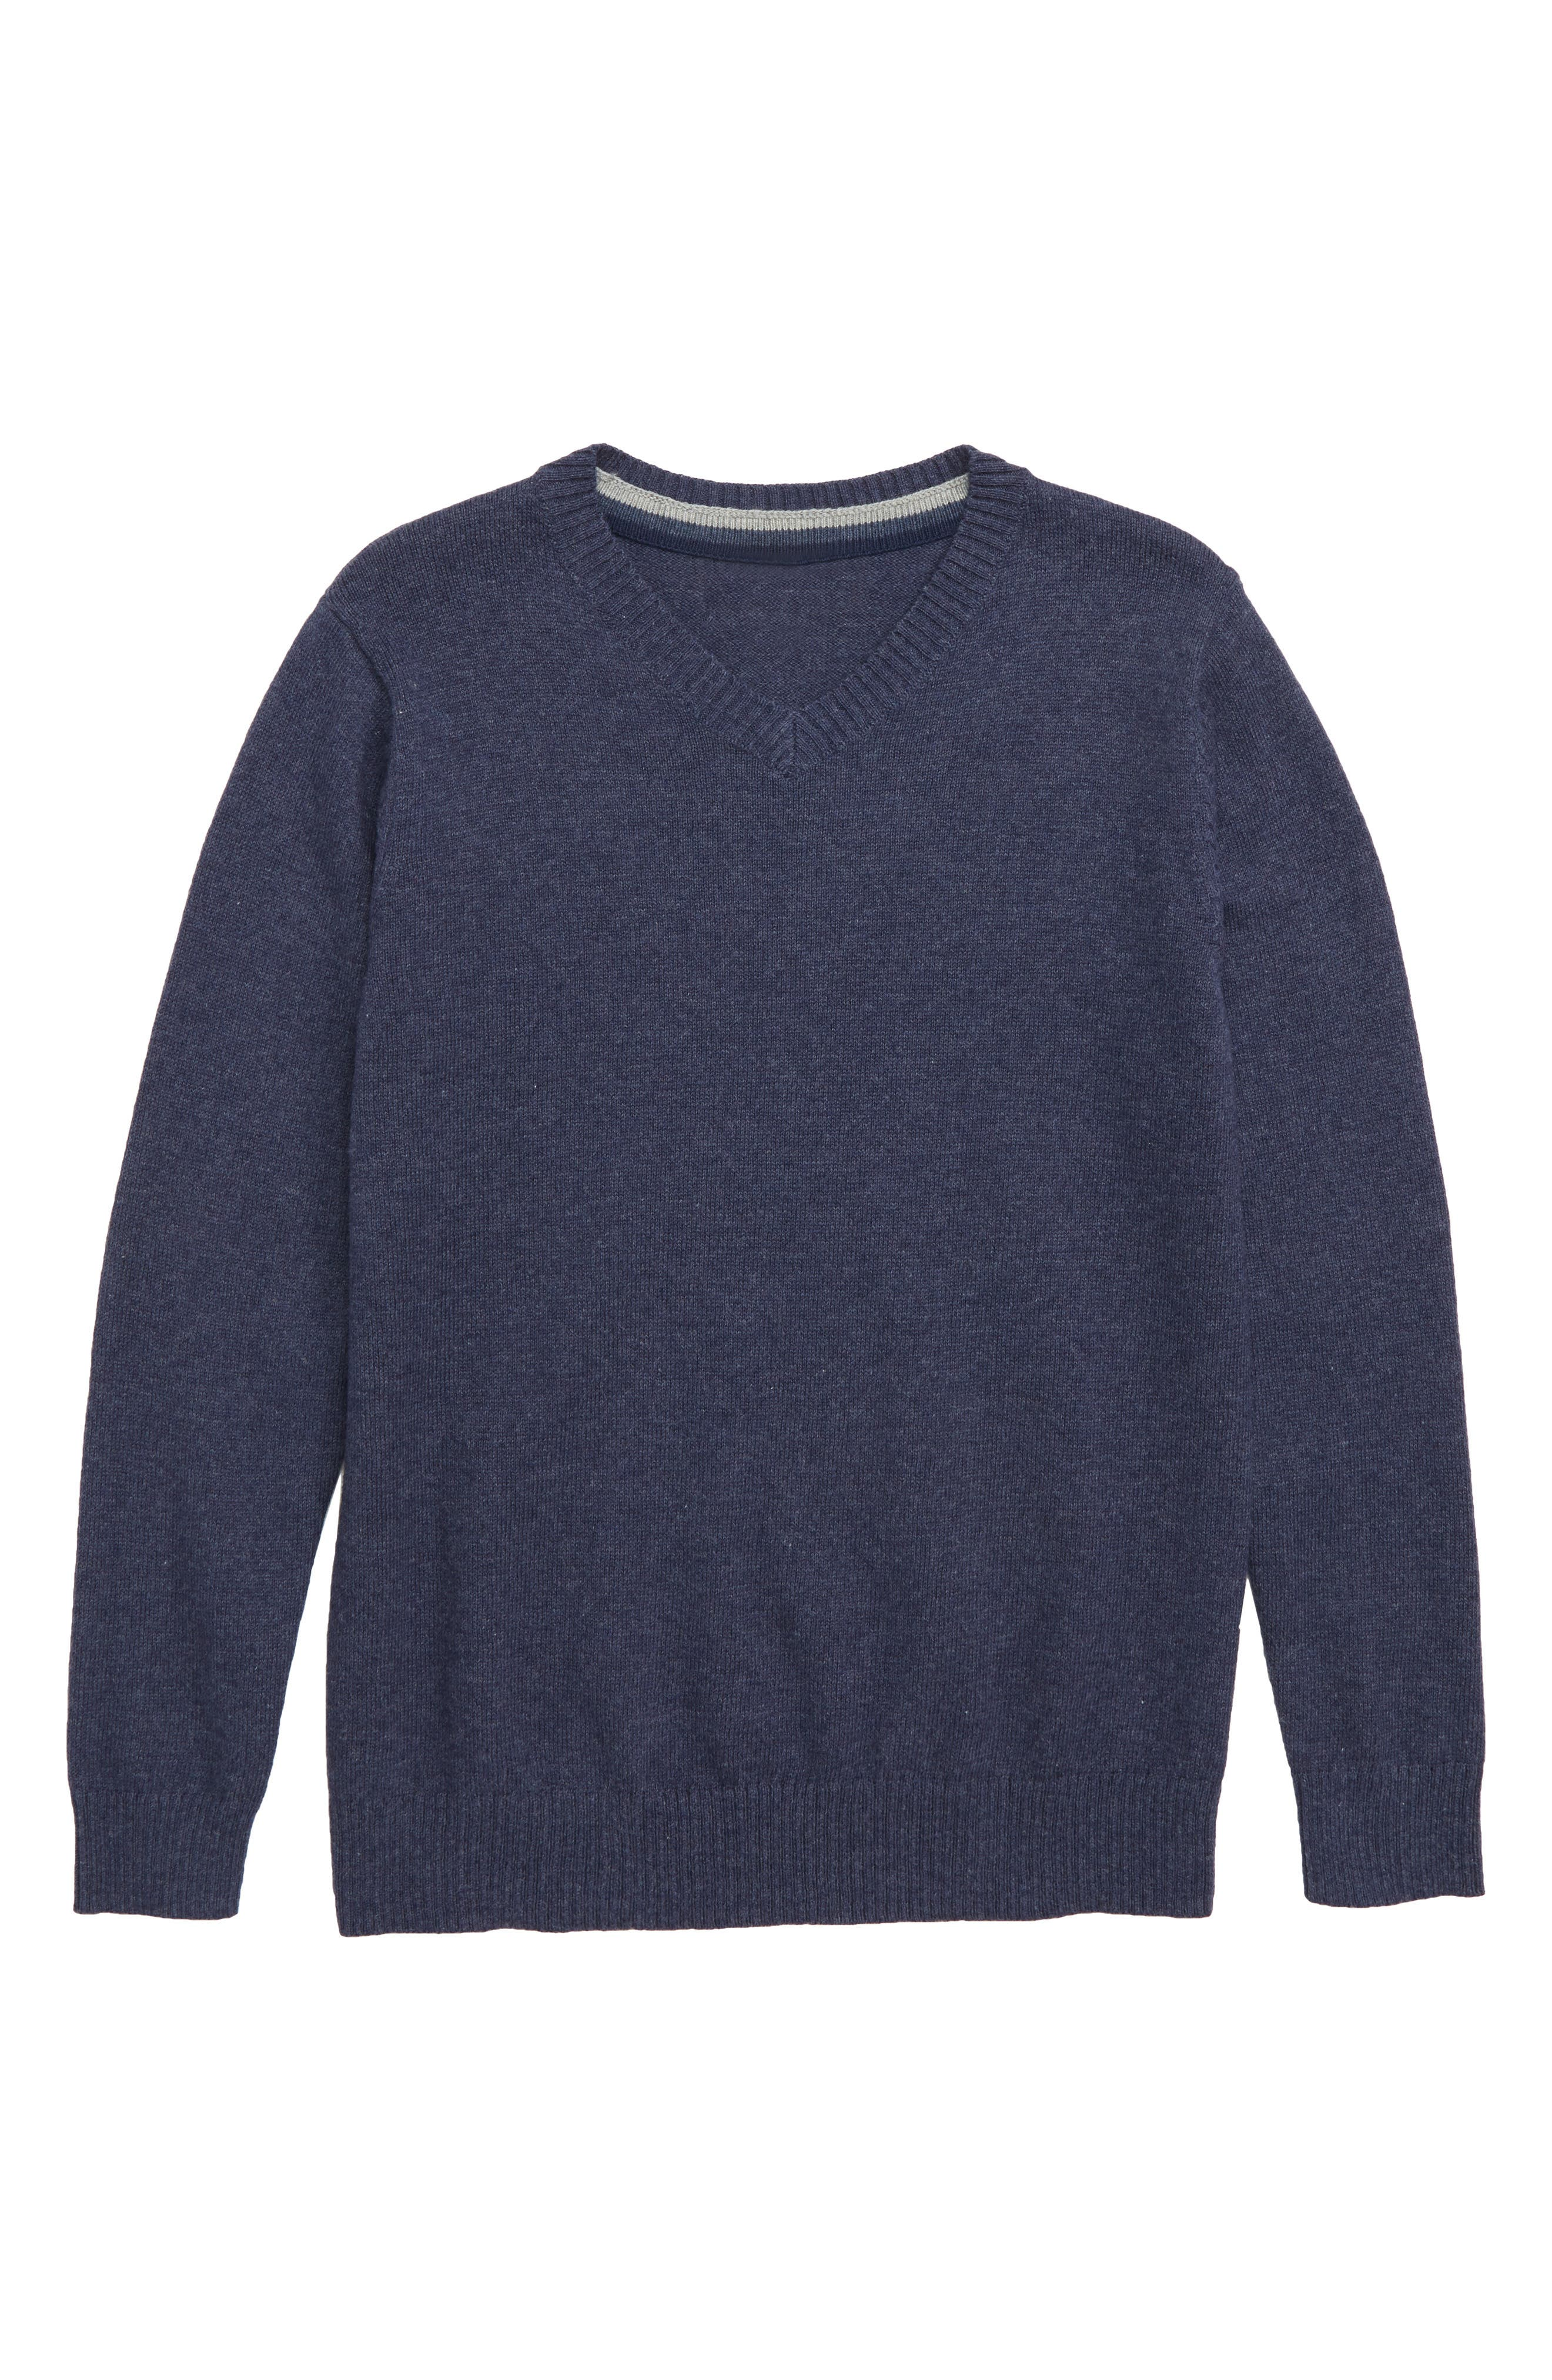 V-Neck Sweater,                         Main,                         color, NAVY BLAZER HEATHER